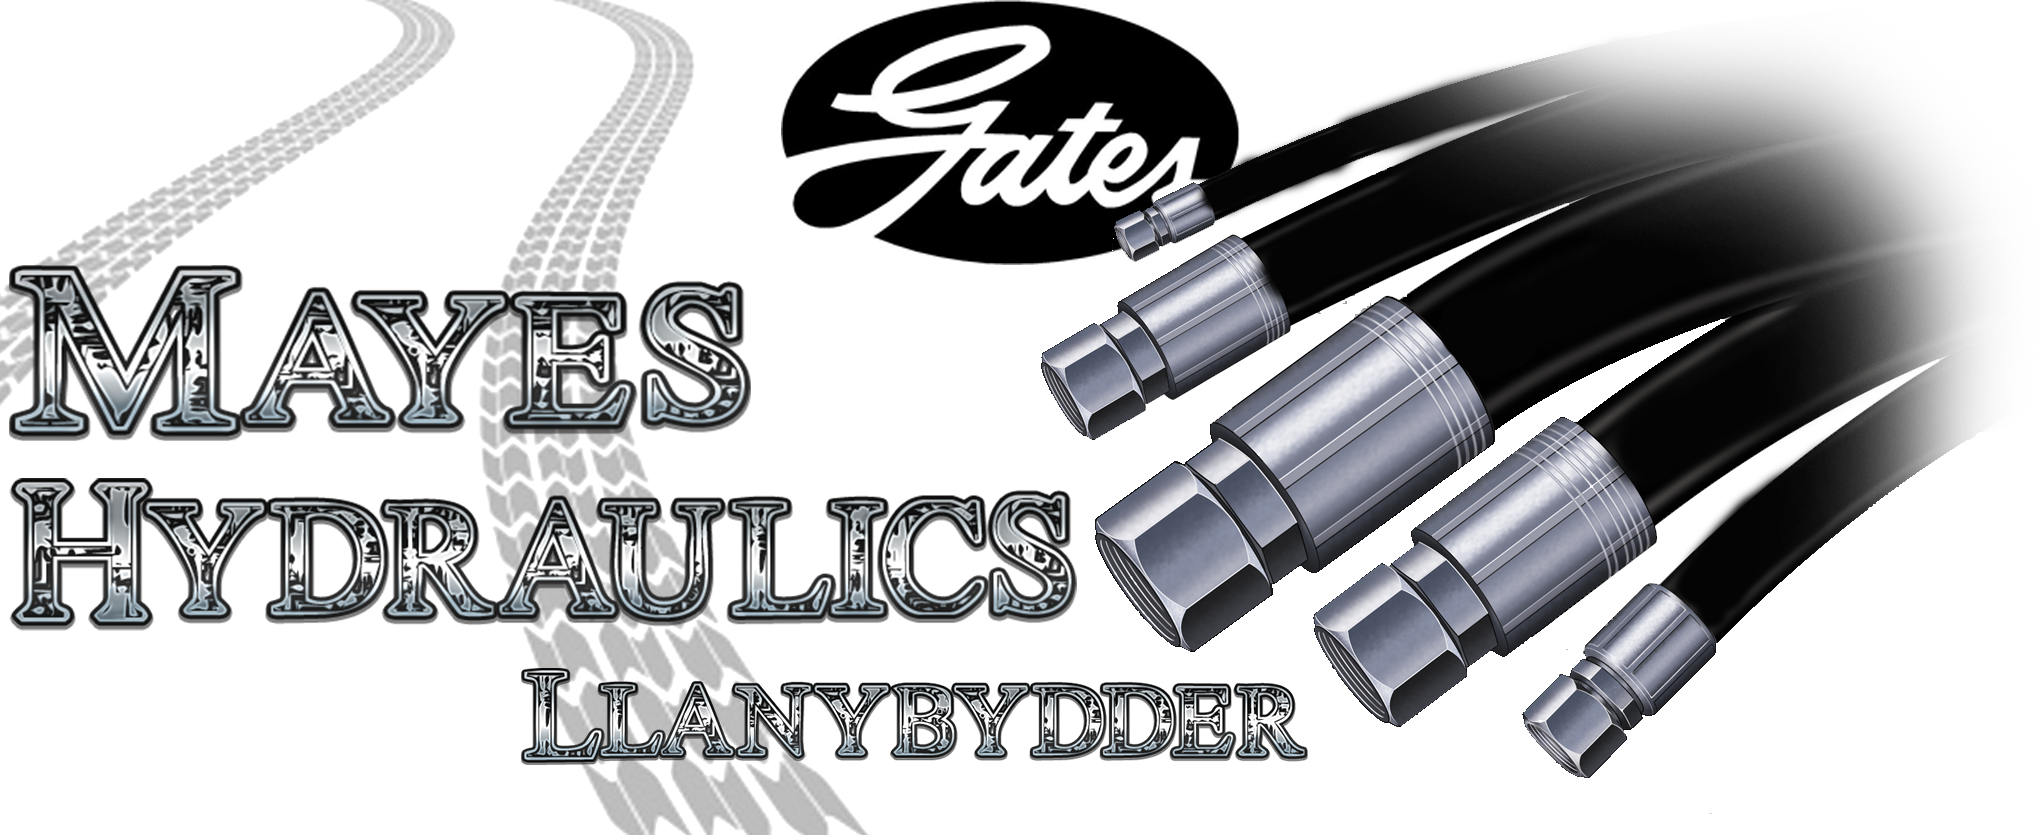 hydraulics.png